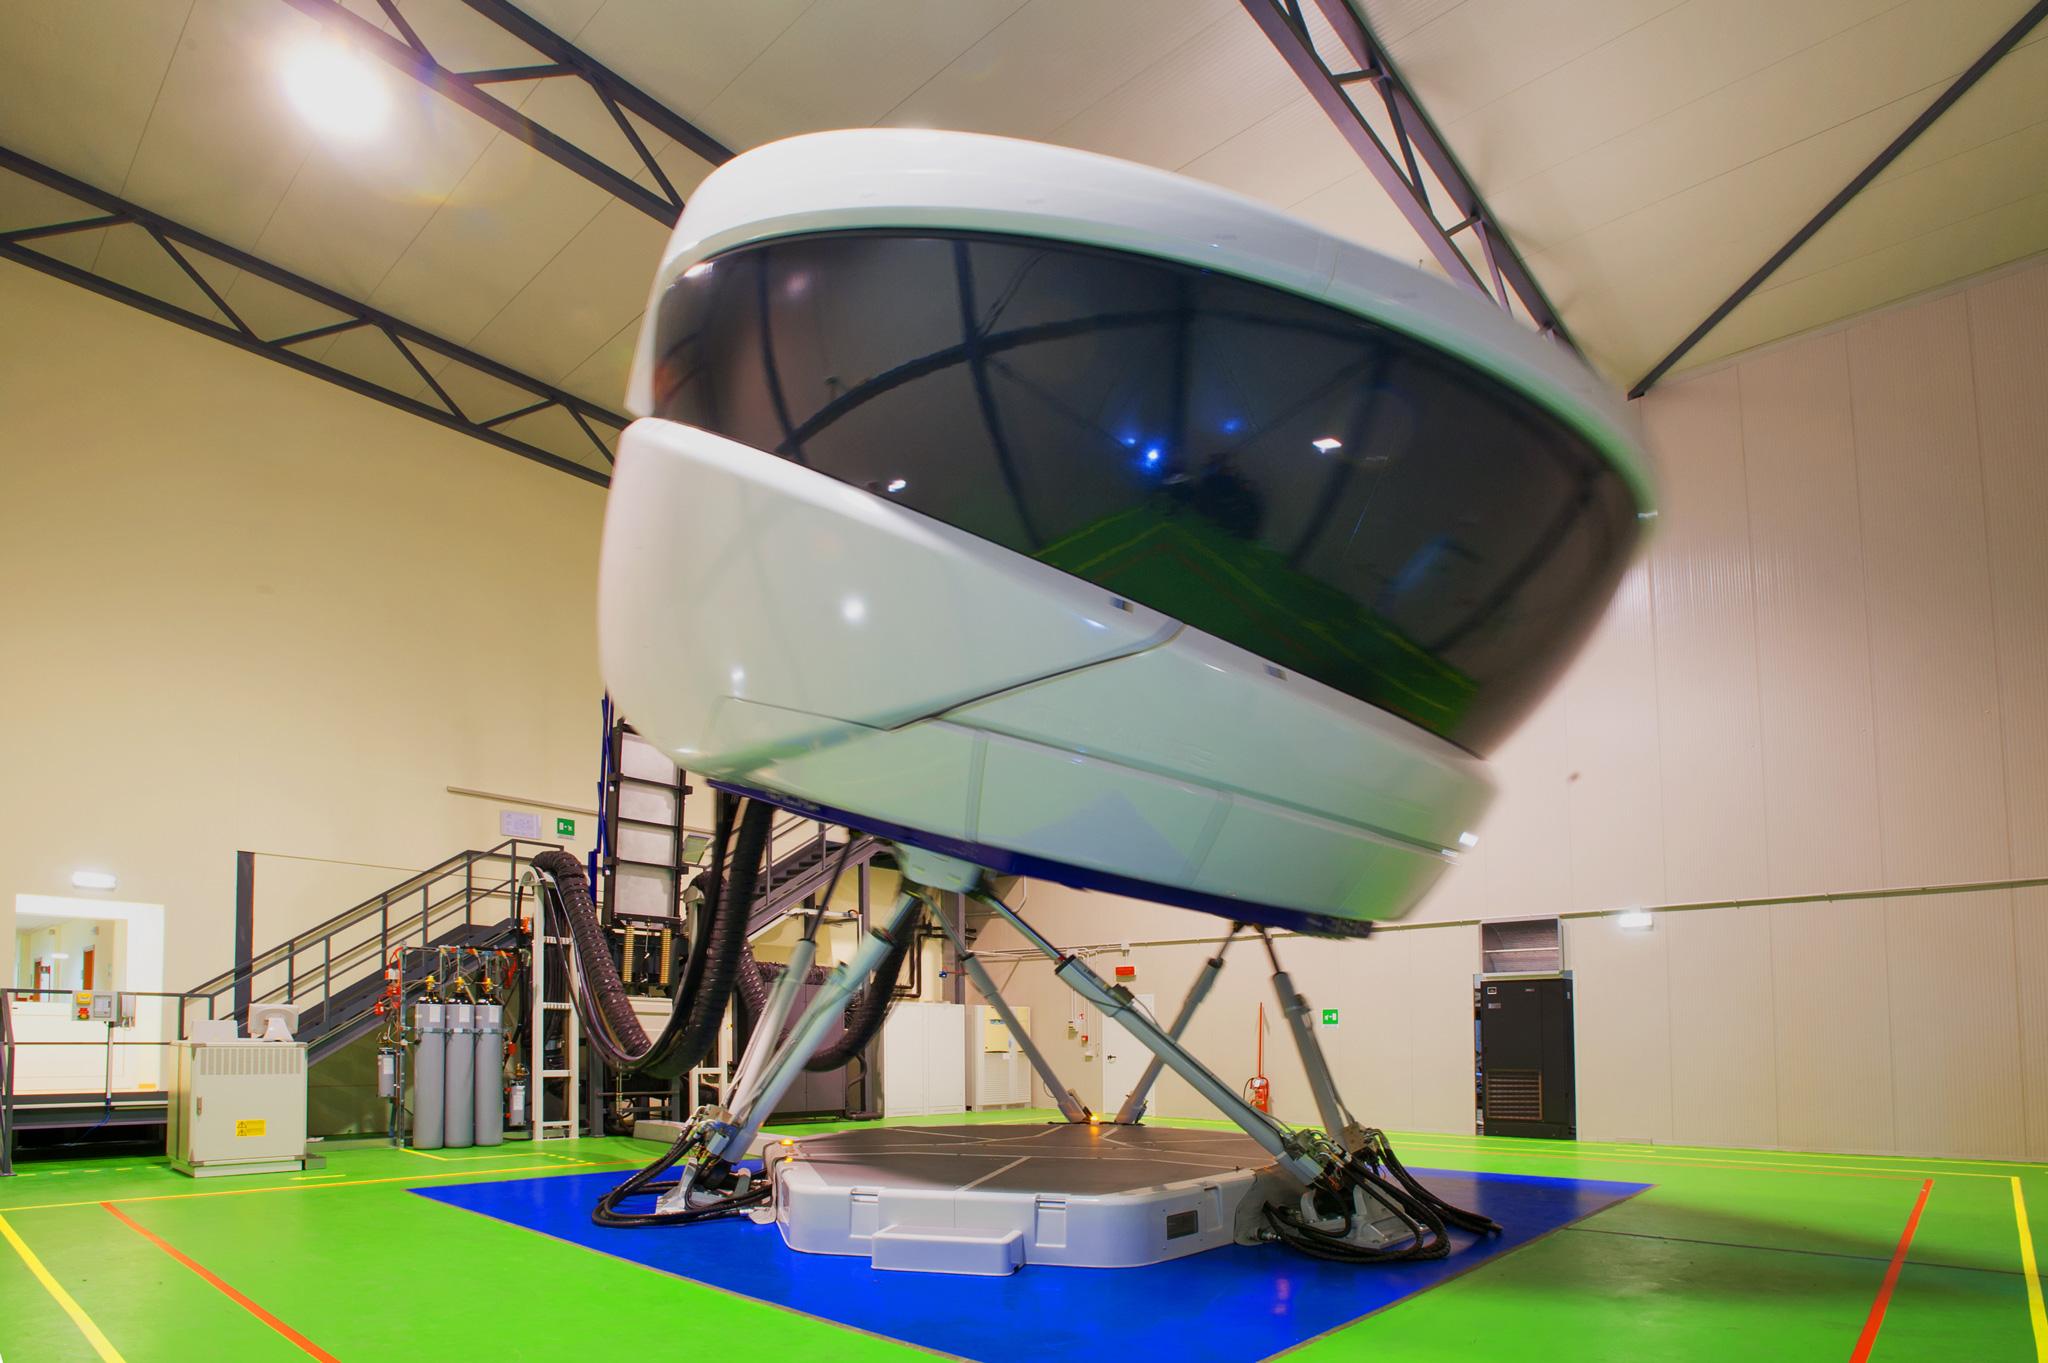 Full flight simulator - Wikipedia